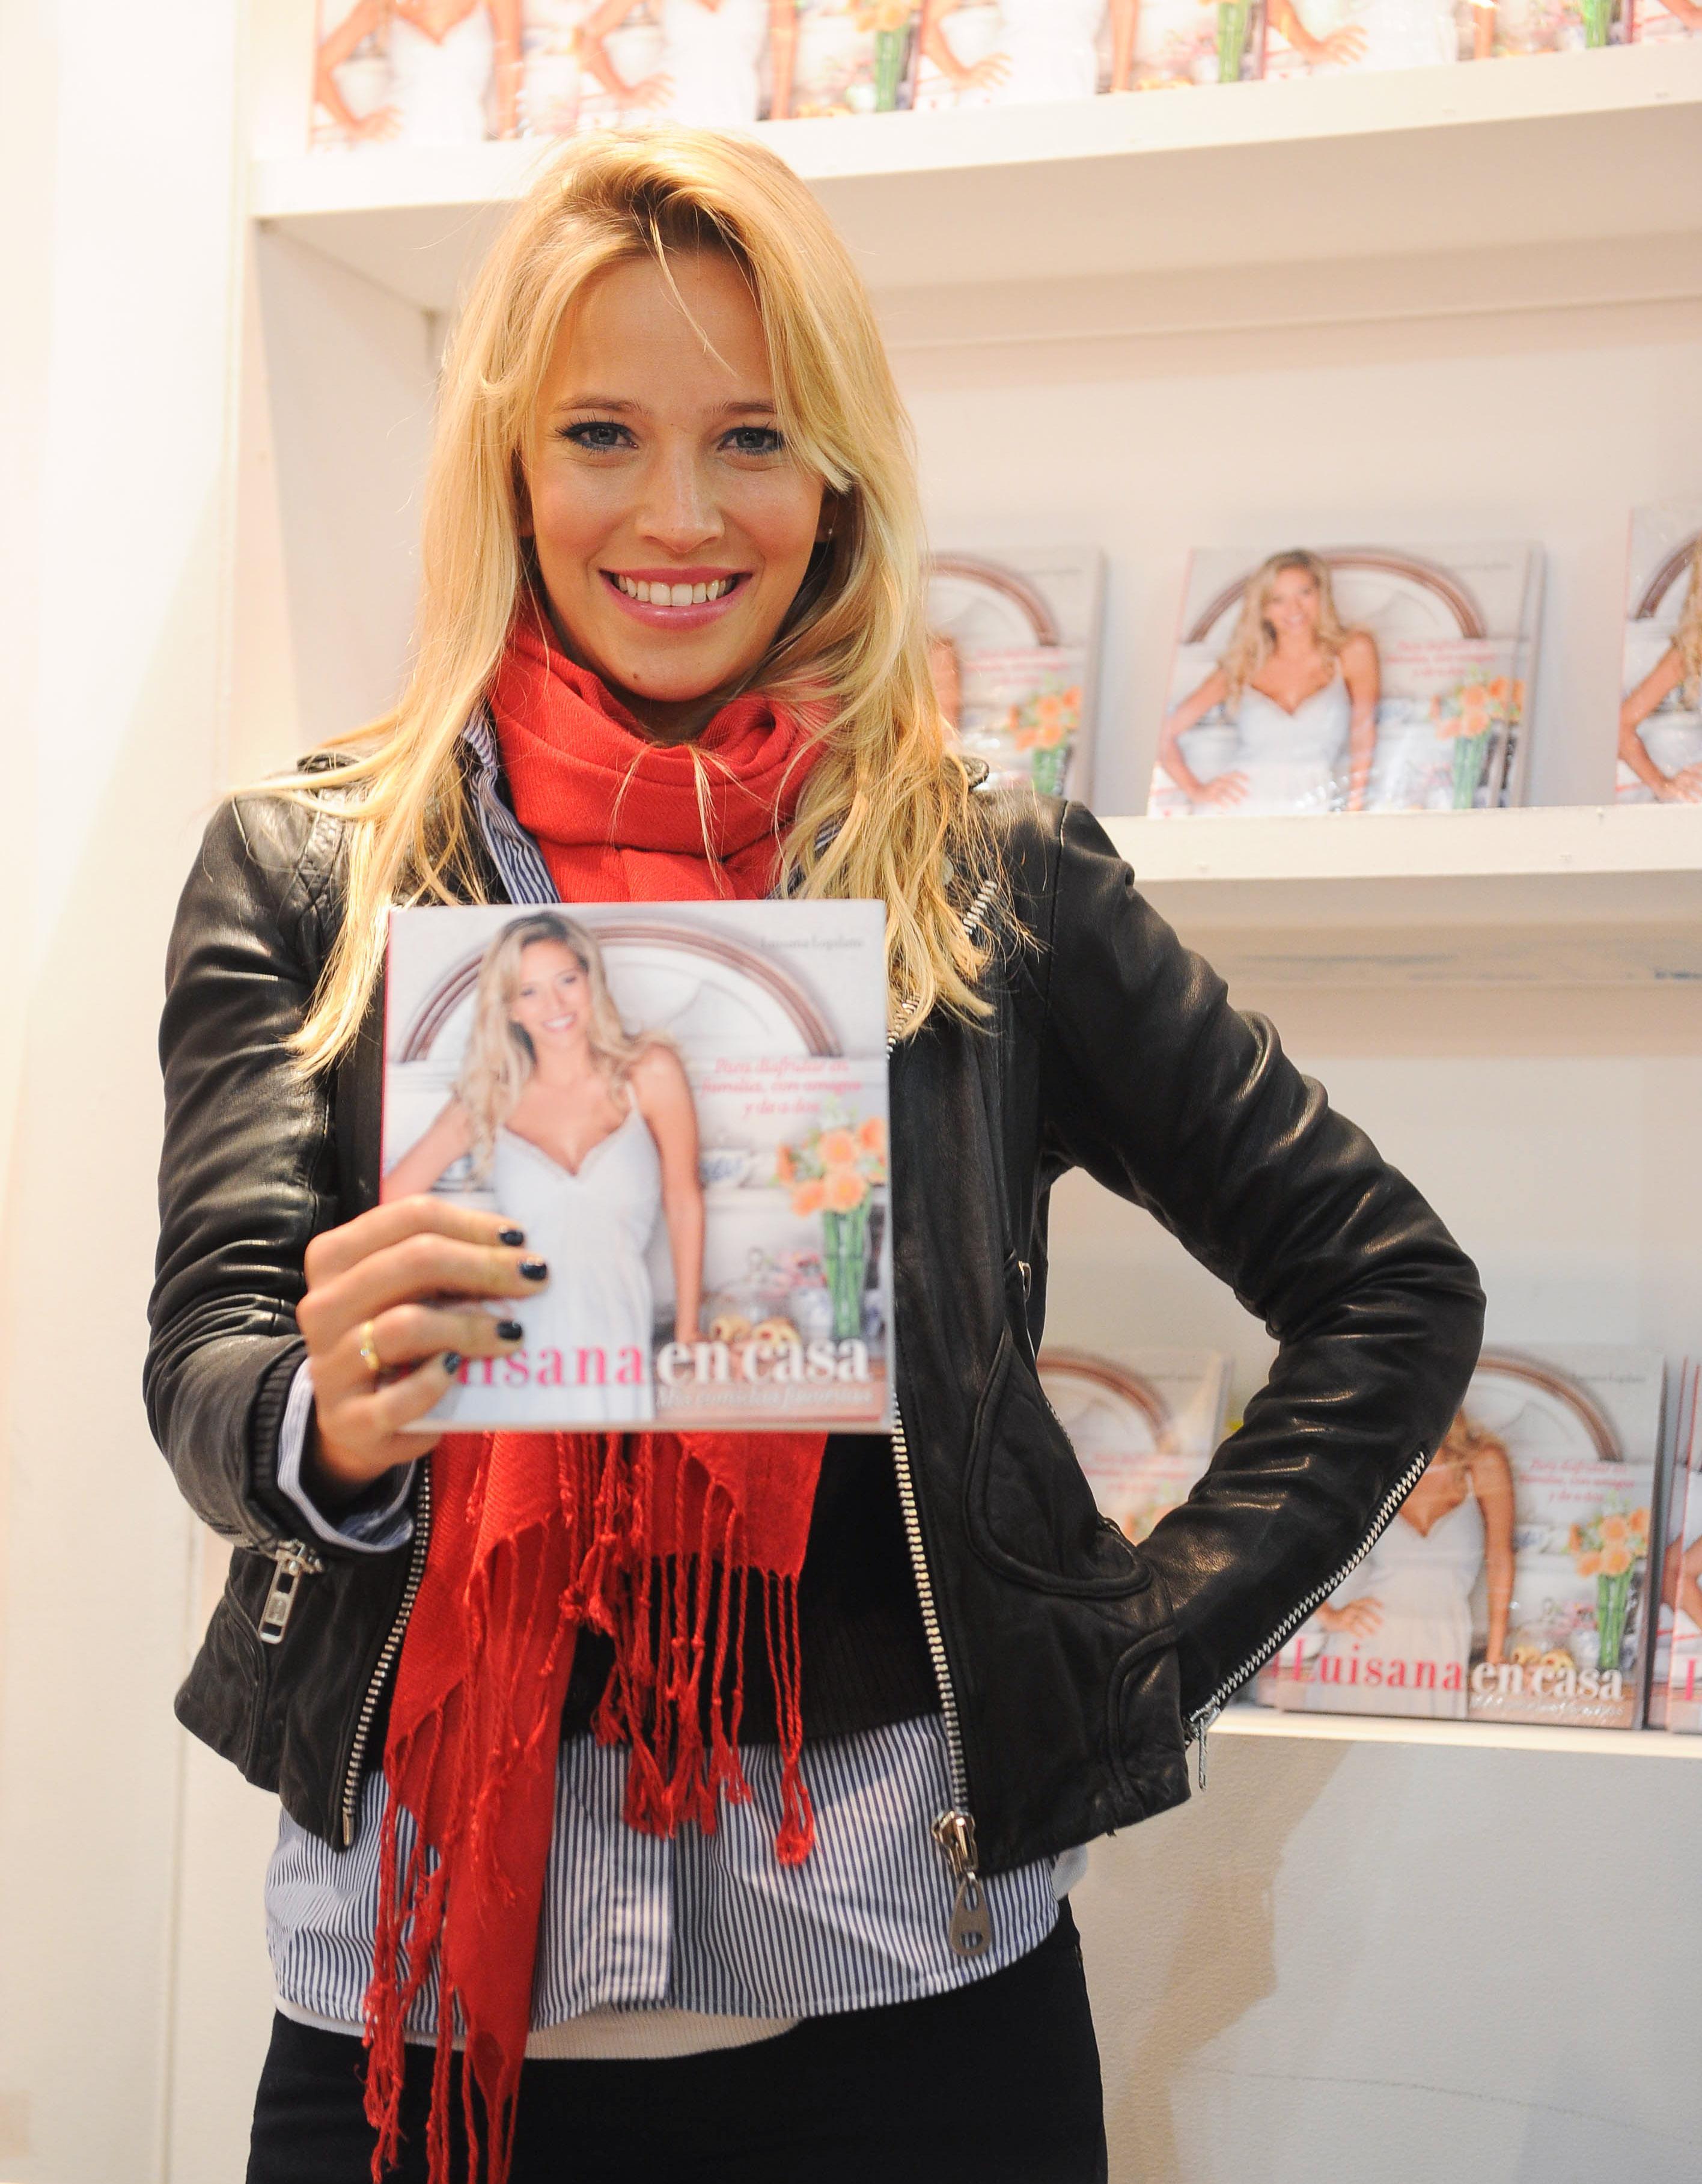 793087826_Luisana_Lopilato_present_her_first_book5_122_169lo.jpg